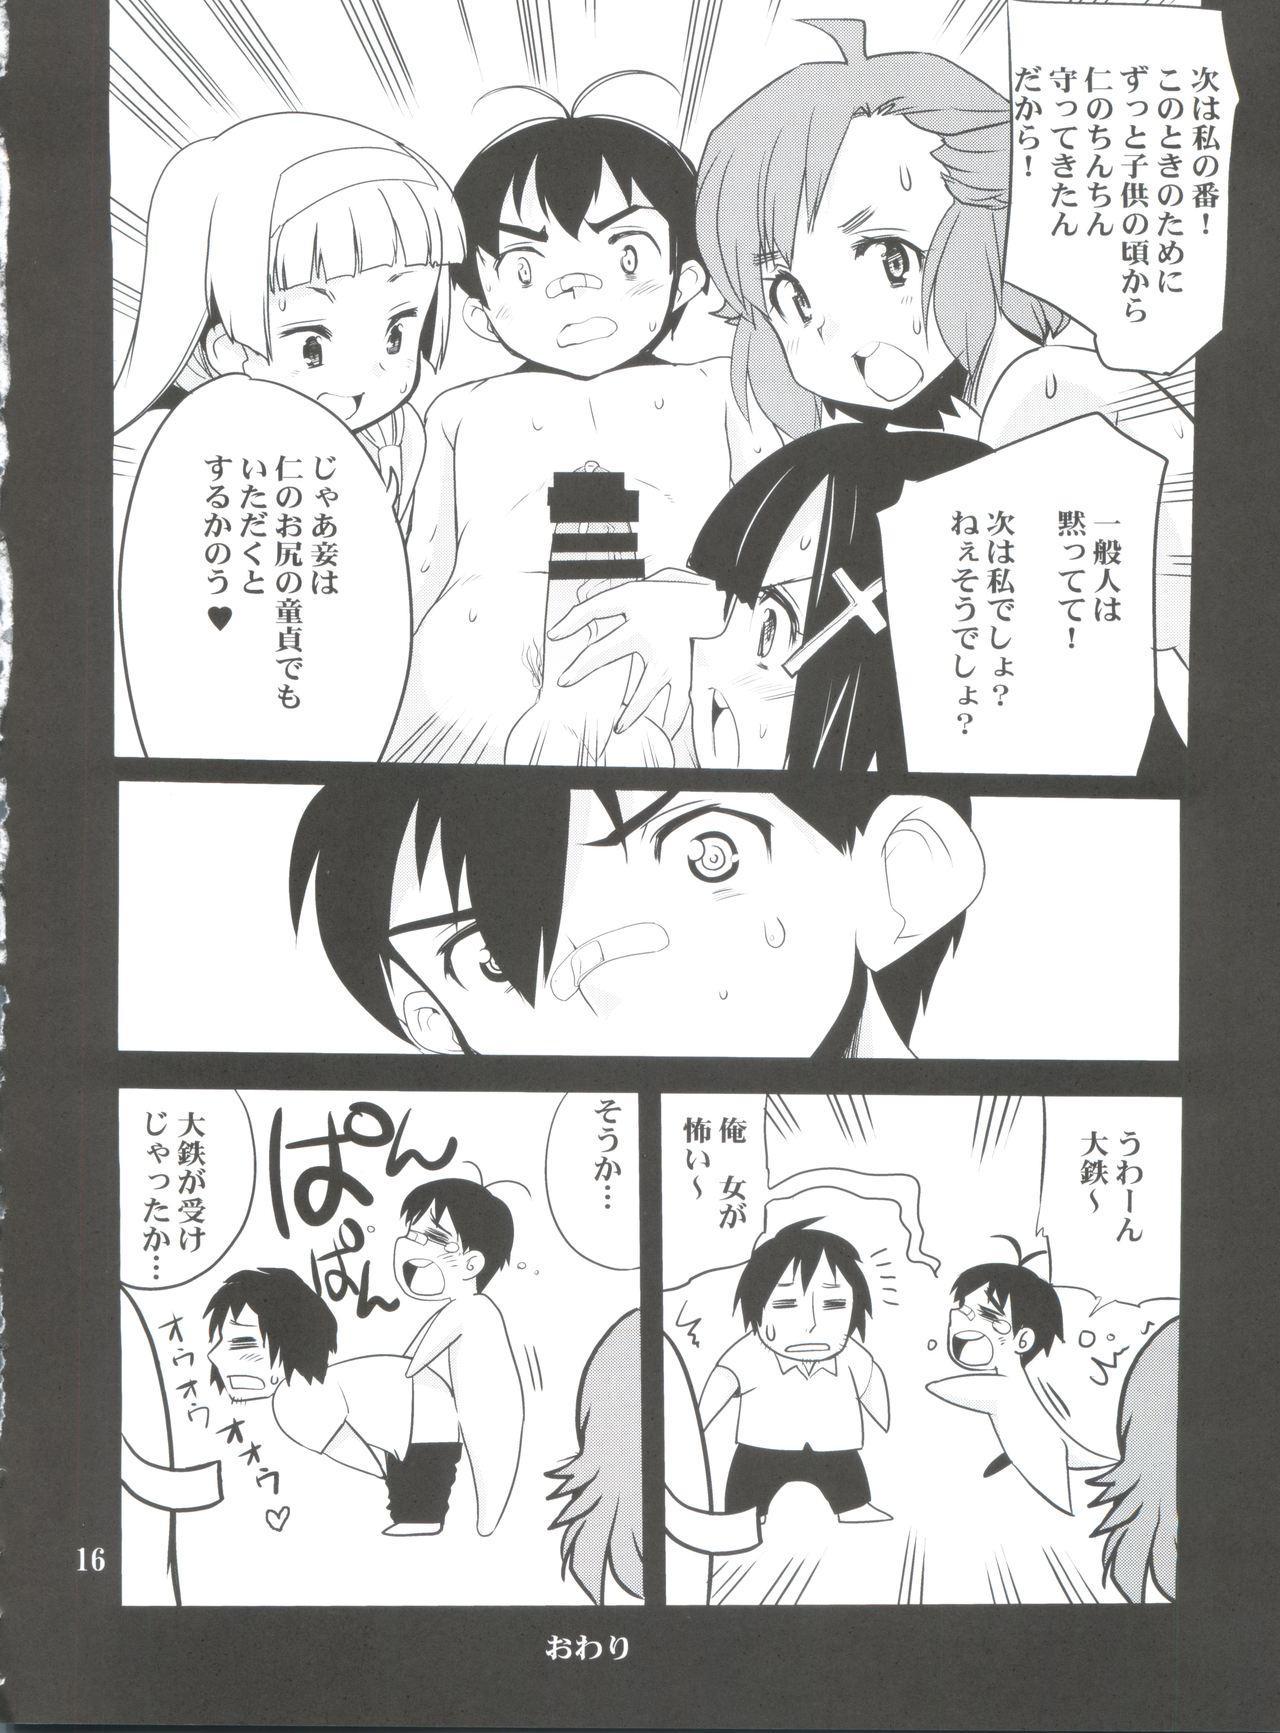 Nagi-sama Recycle 14